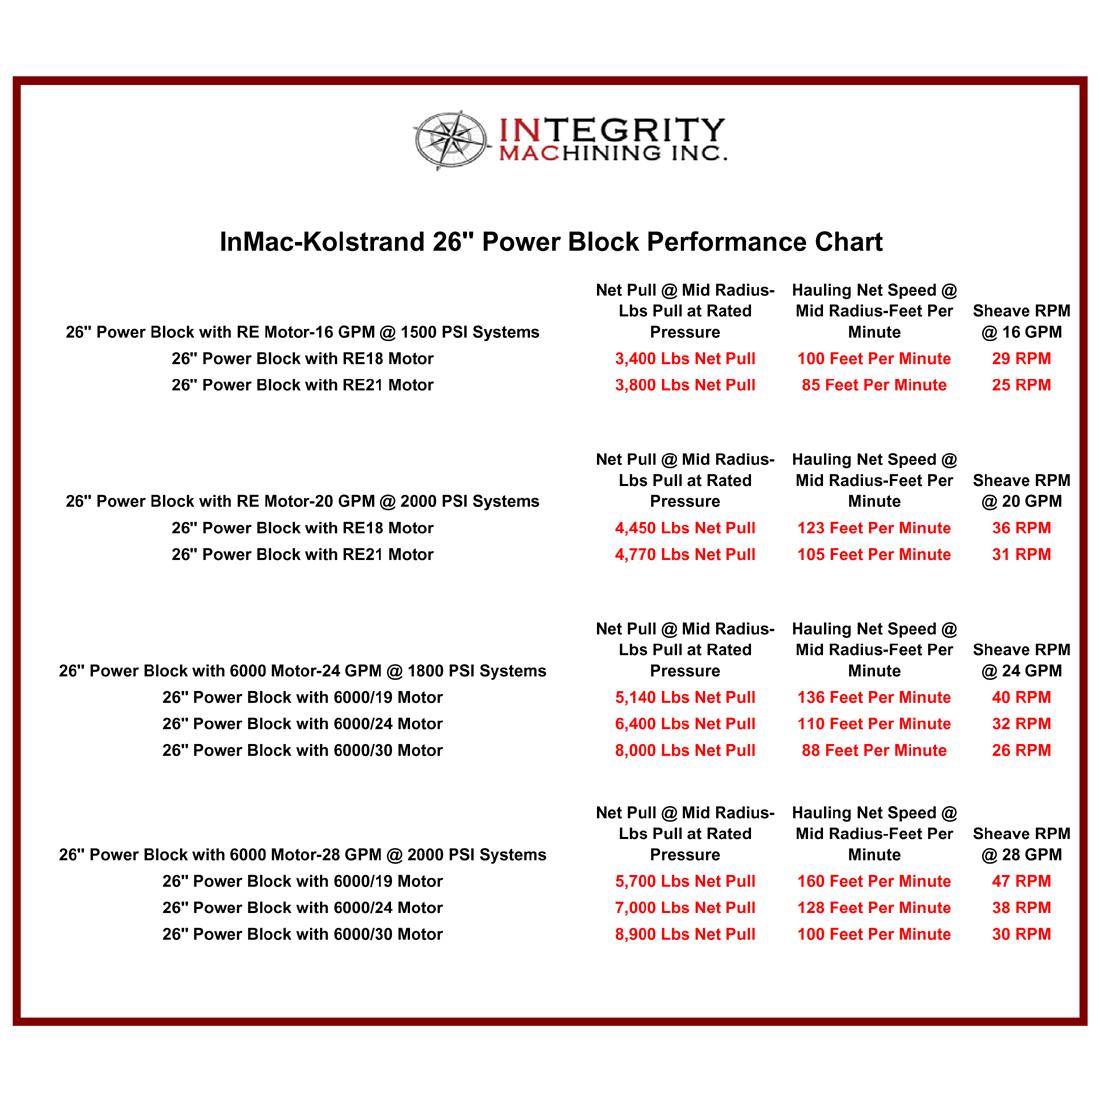 26-in-power-block-performance-spreadsheet-copy.jpg